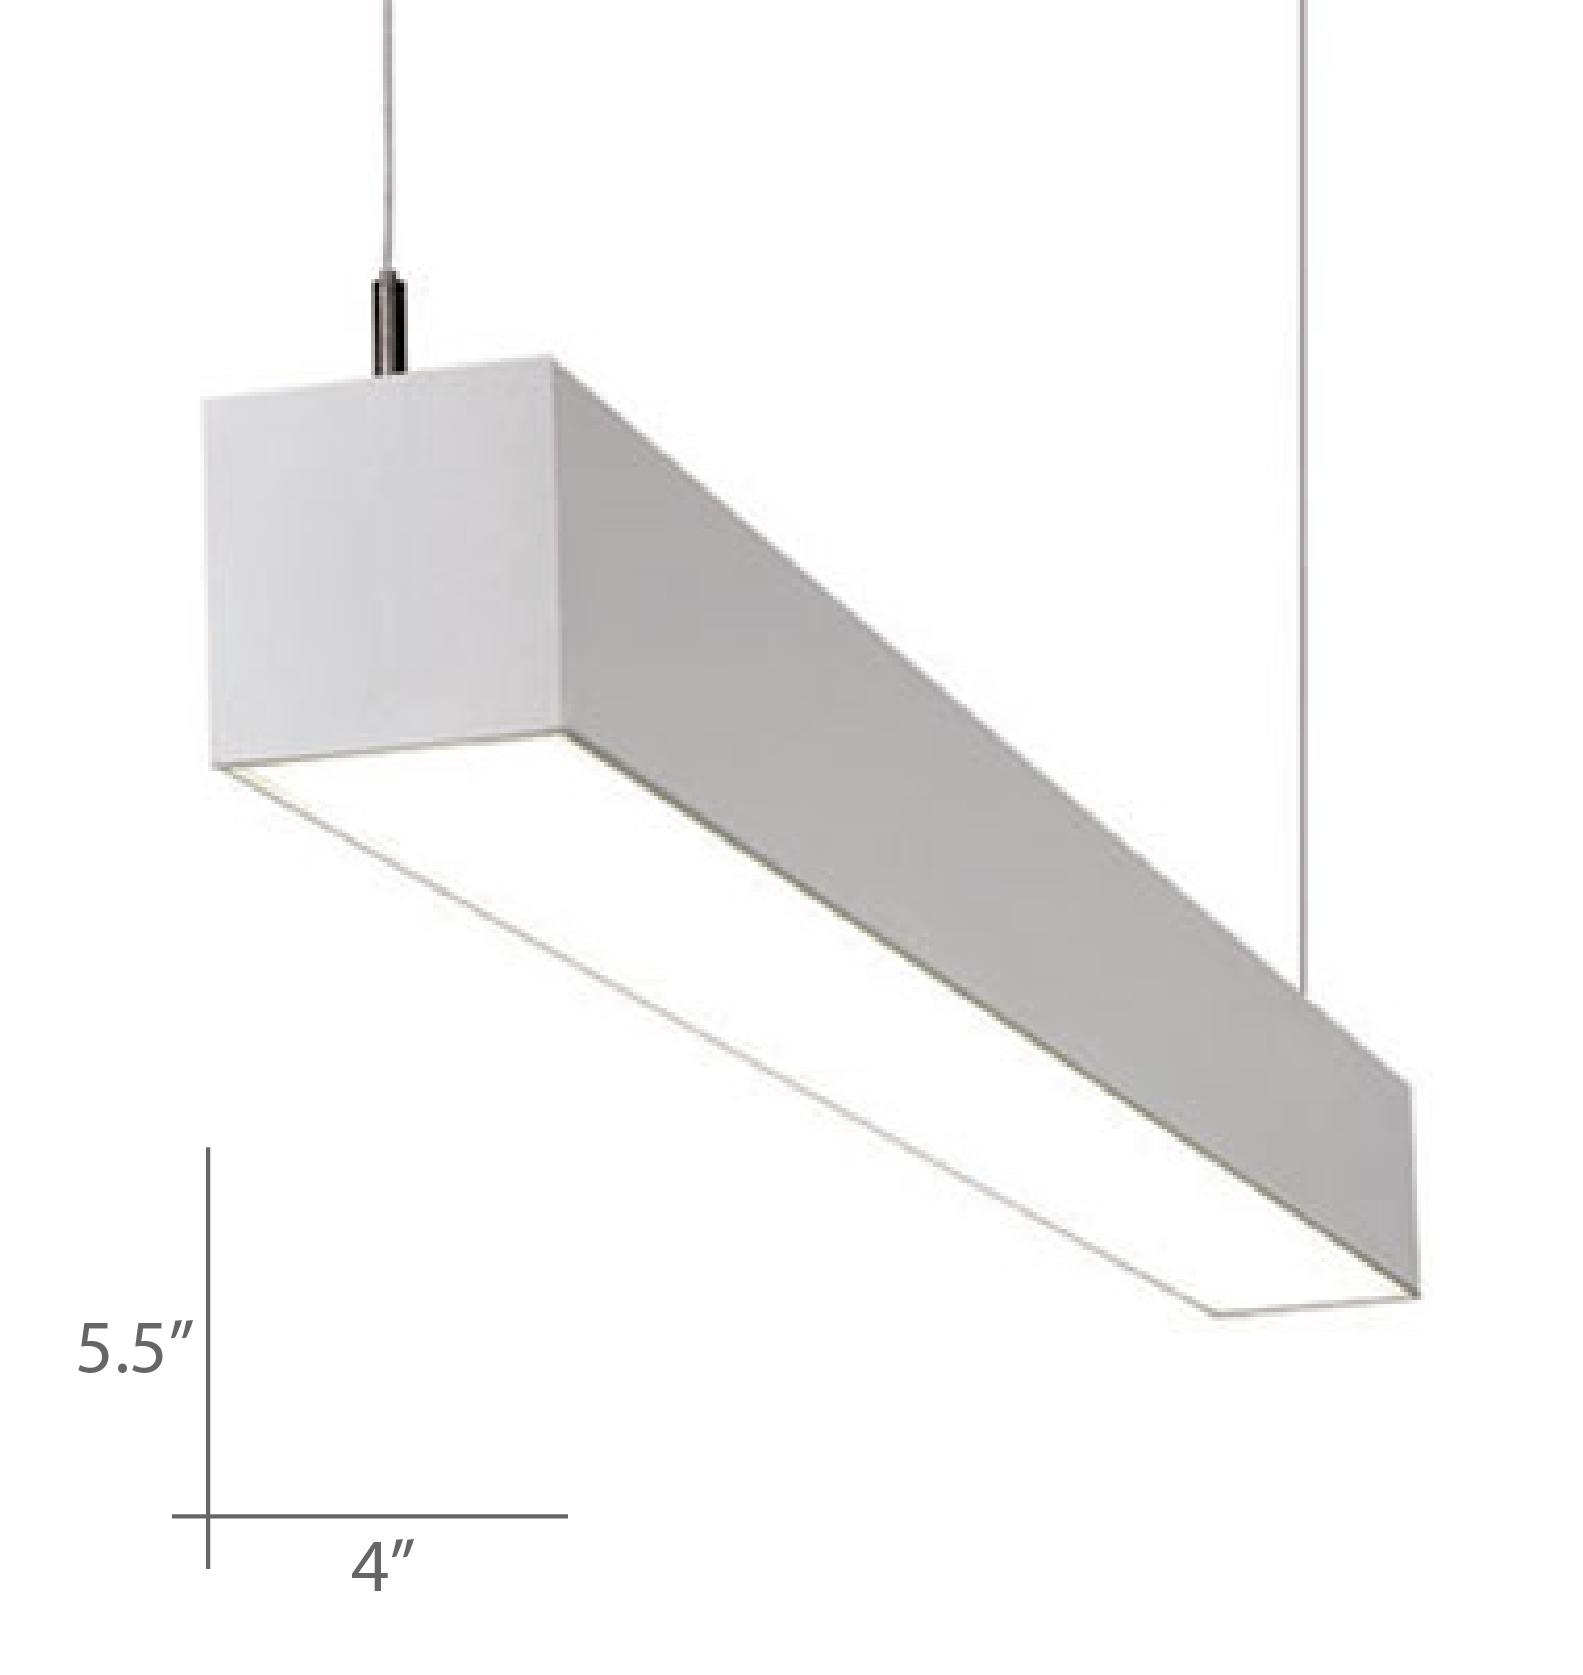 Alcon Lighting 12100 45 P Continuum 45 Series Architectural